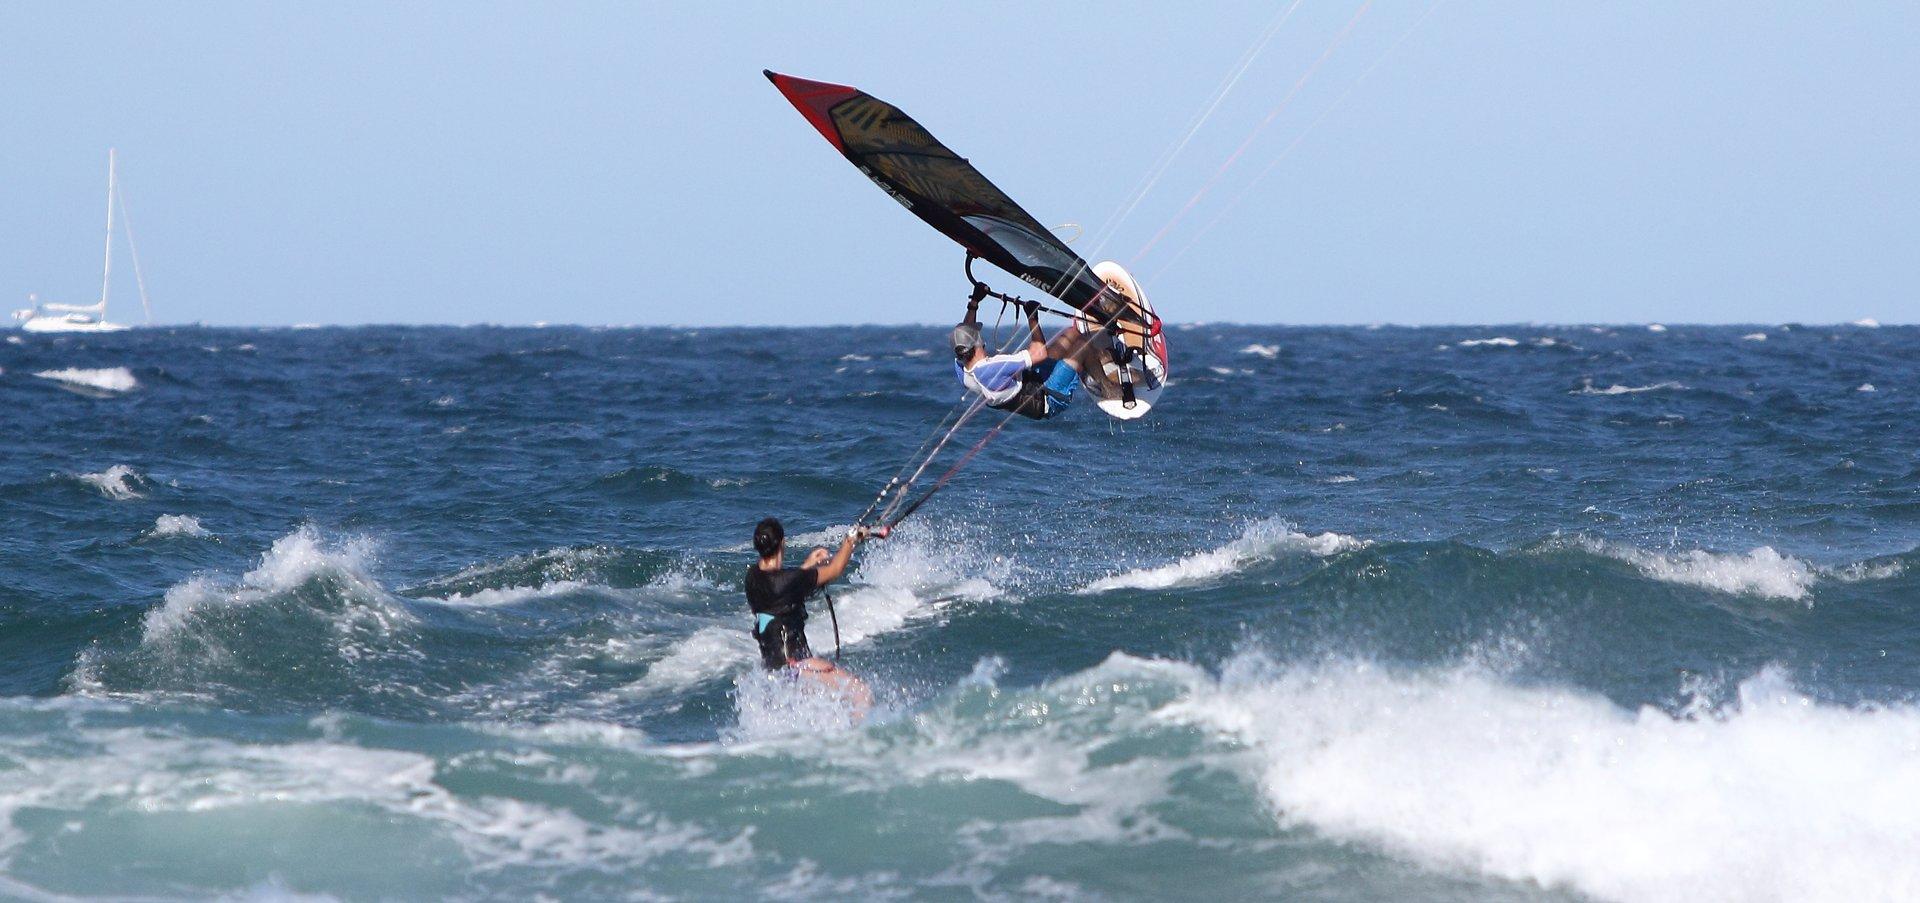 Best time for Kitesurfing and Windsurfing in Australia 2020